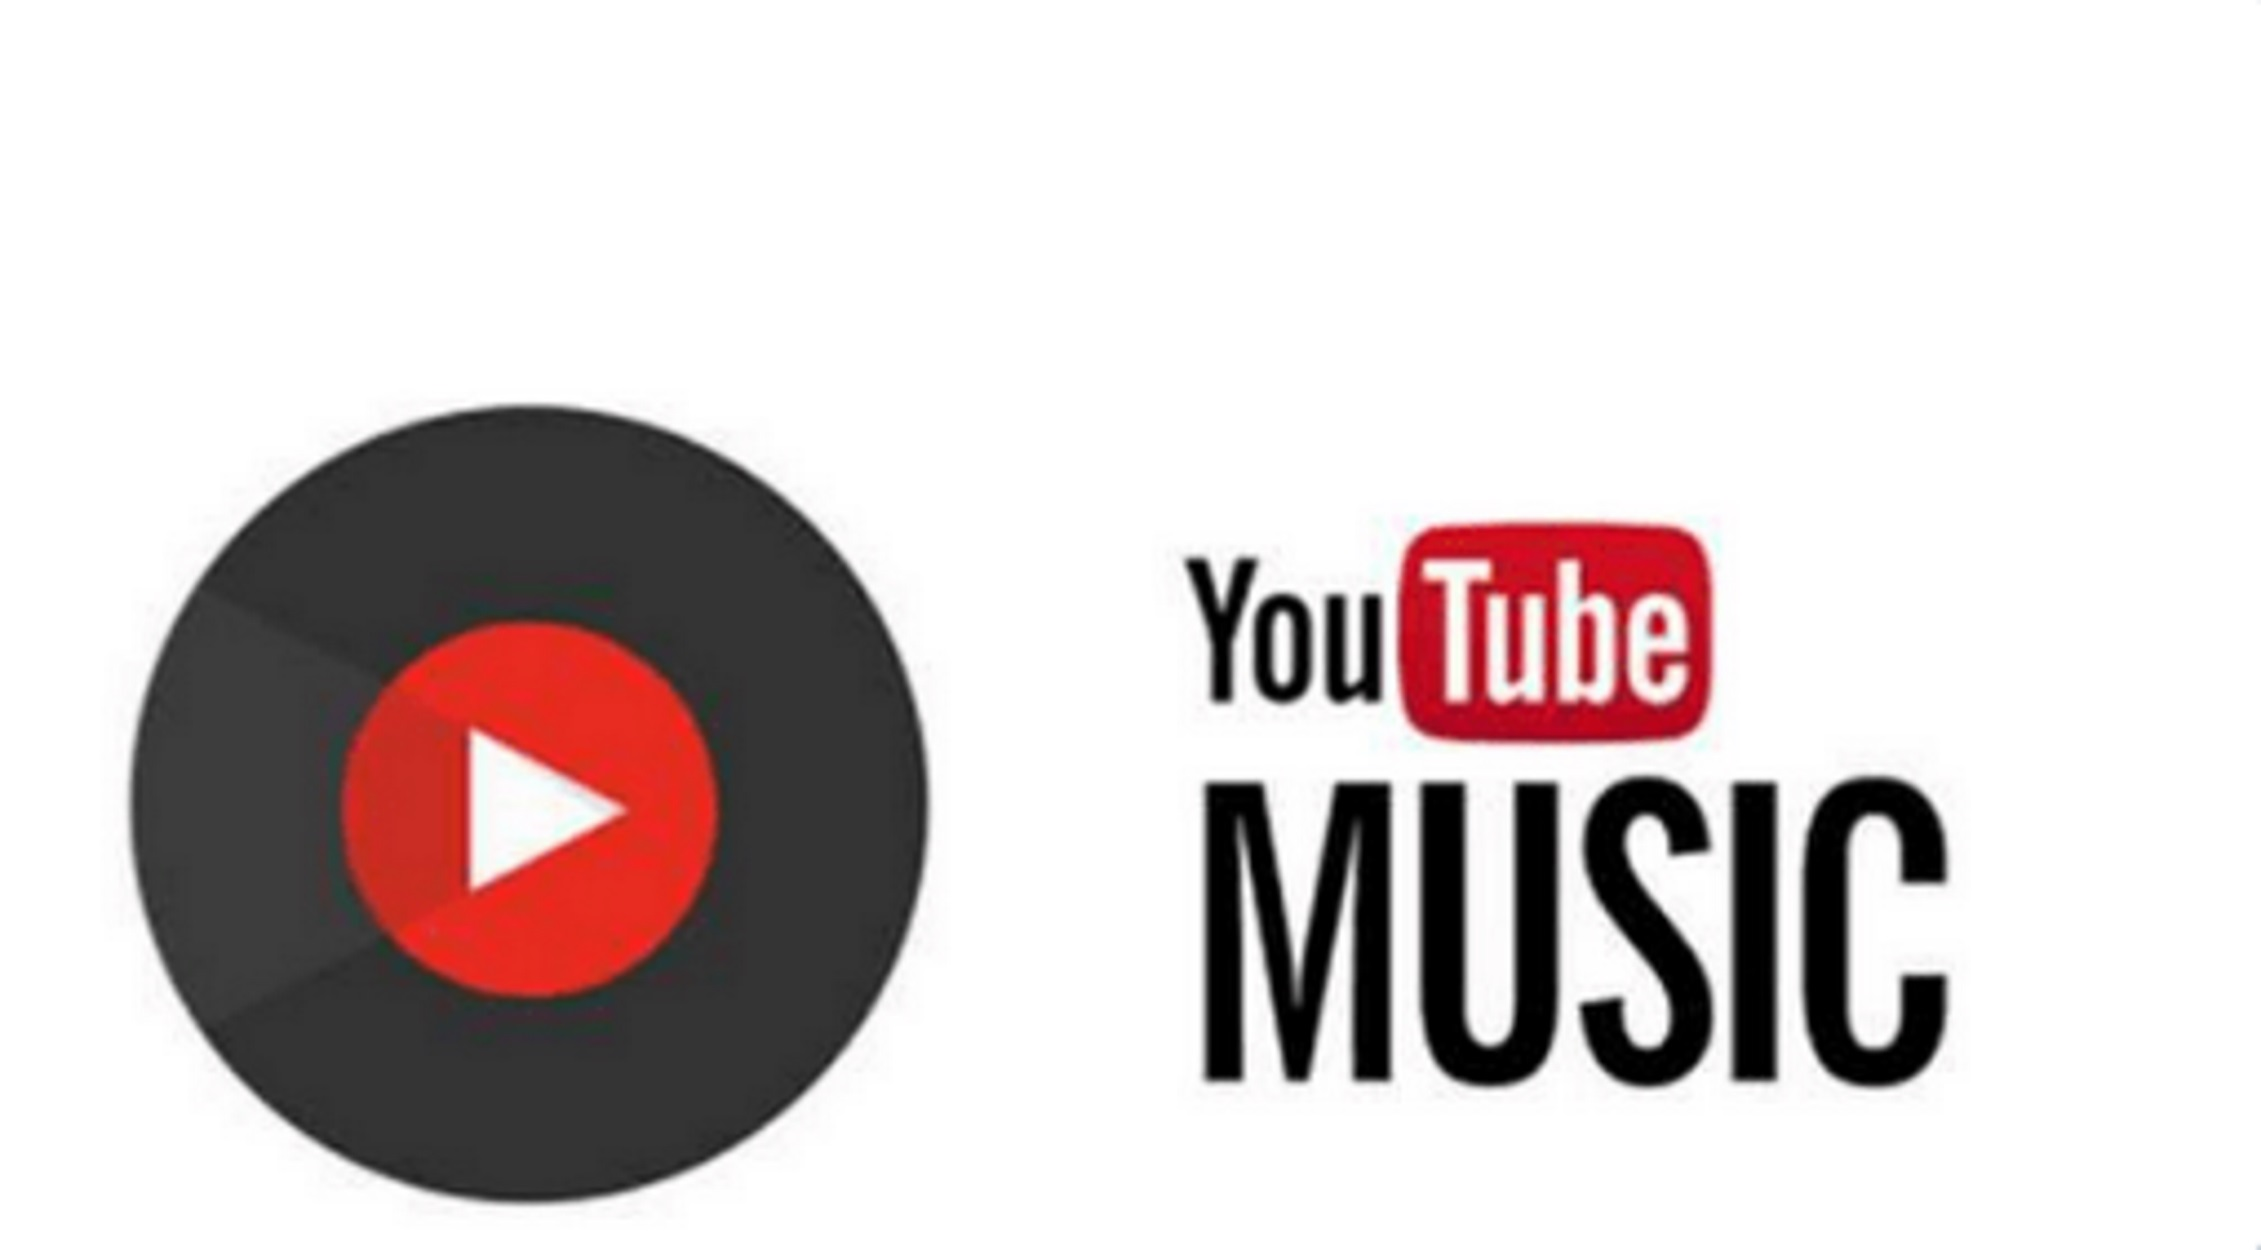 YouTube Music: Η νέα εφαρμογή διαθέσιμη τώρα και στην Ελλάδα!